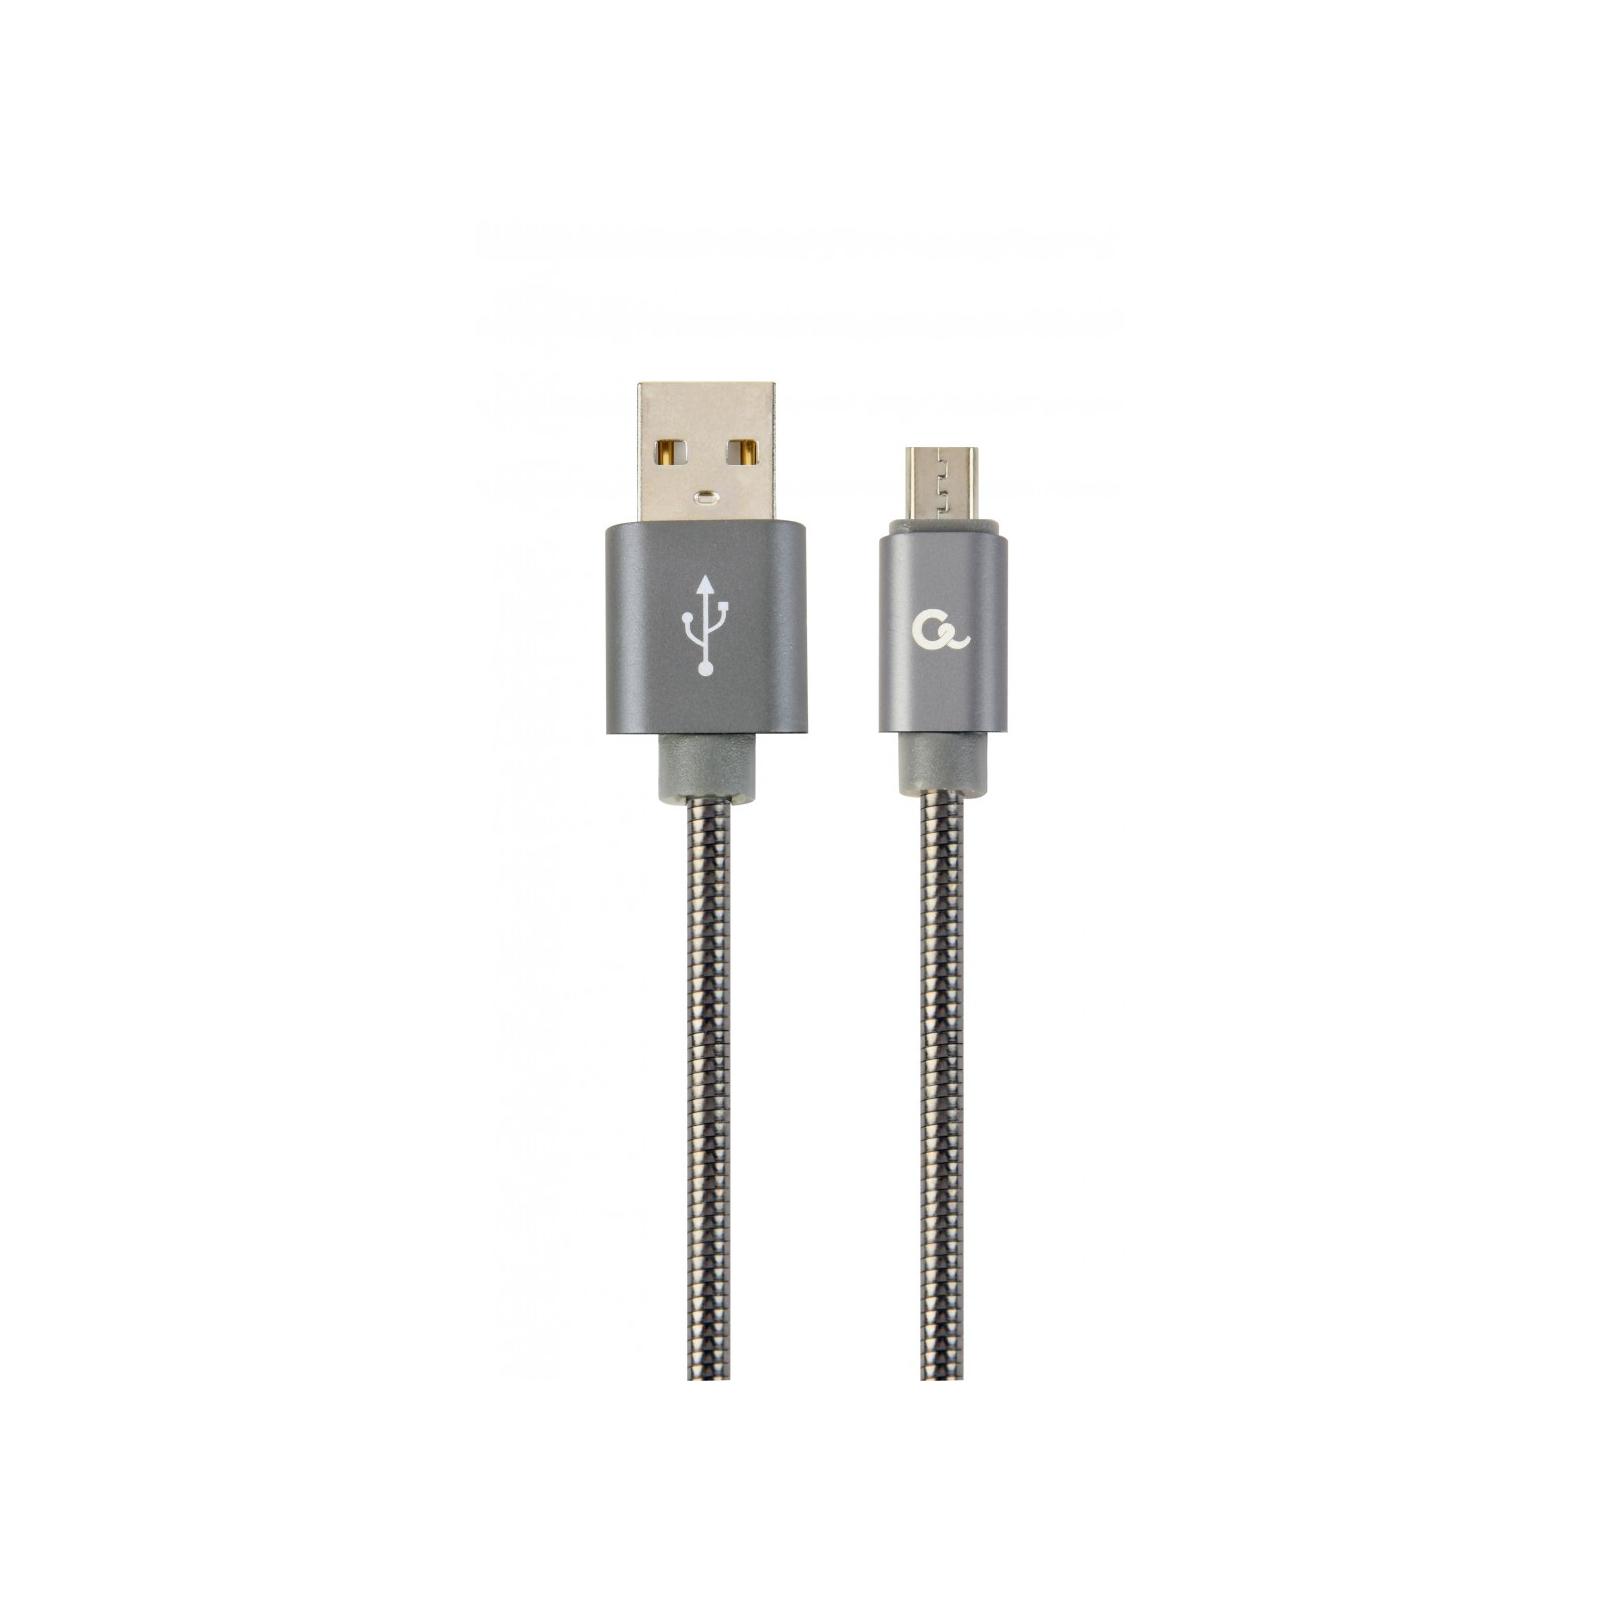 Дата кабель USB 2.0 AM to Micro 5P 2.0m Cablexpert (CC-USB2S-AMmBM-2M-BG)